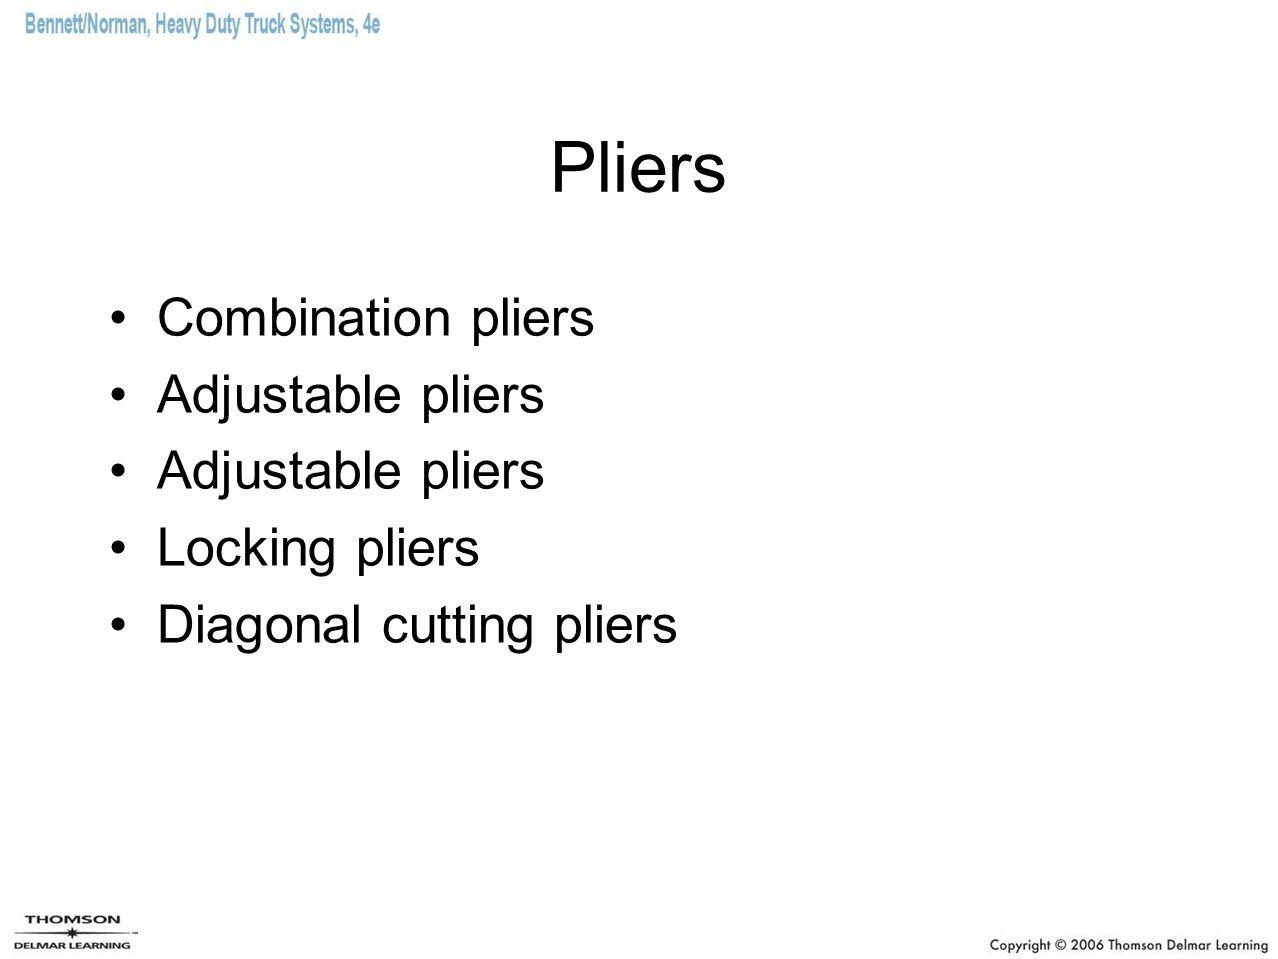 Pliers Combination pliers Adjustable pliers Locking pliers Diagonal cutting pliers